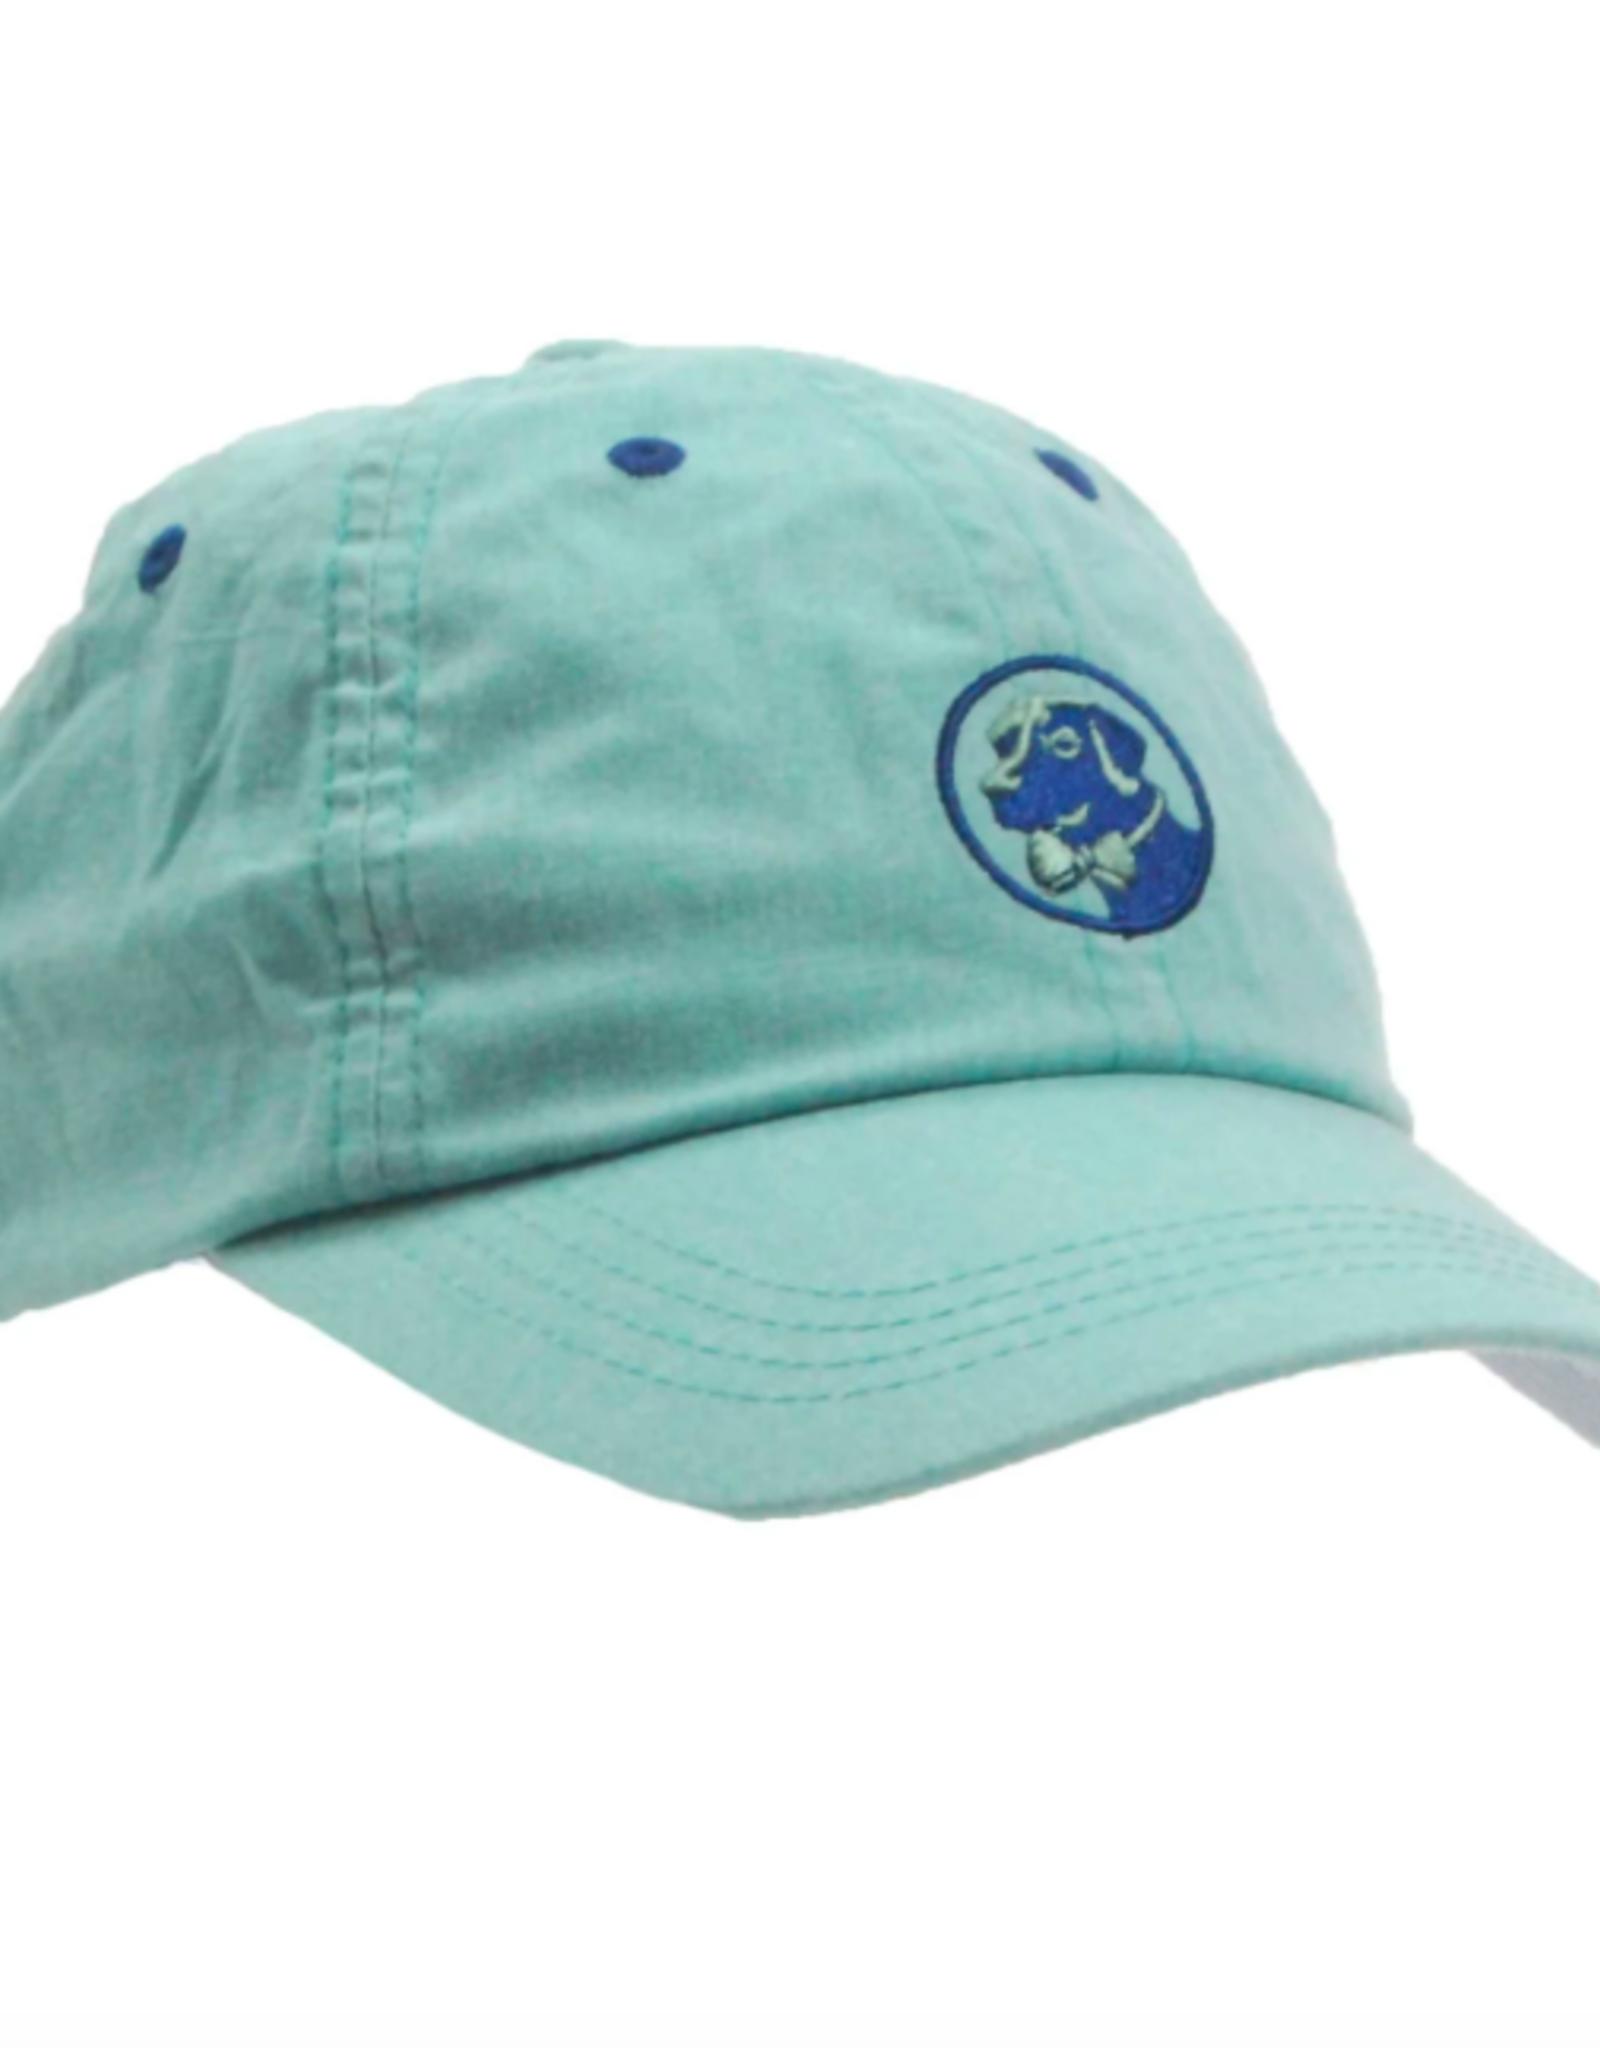 Southern Proper Summer Weight Frat Hat